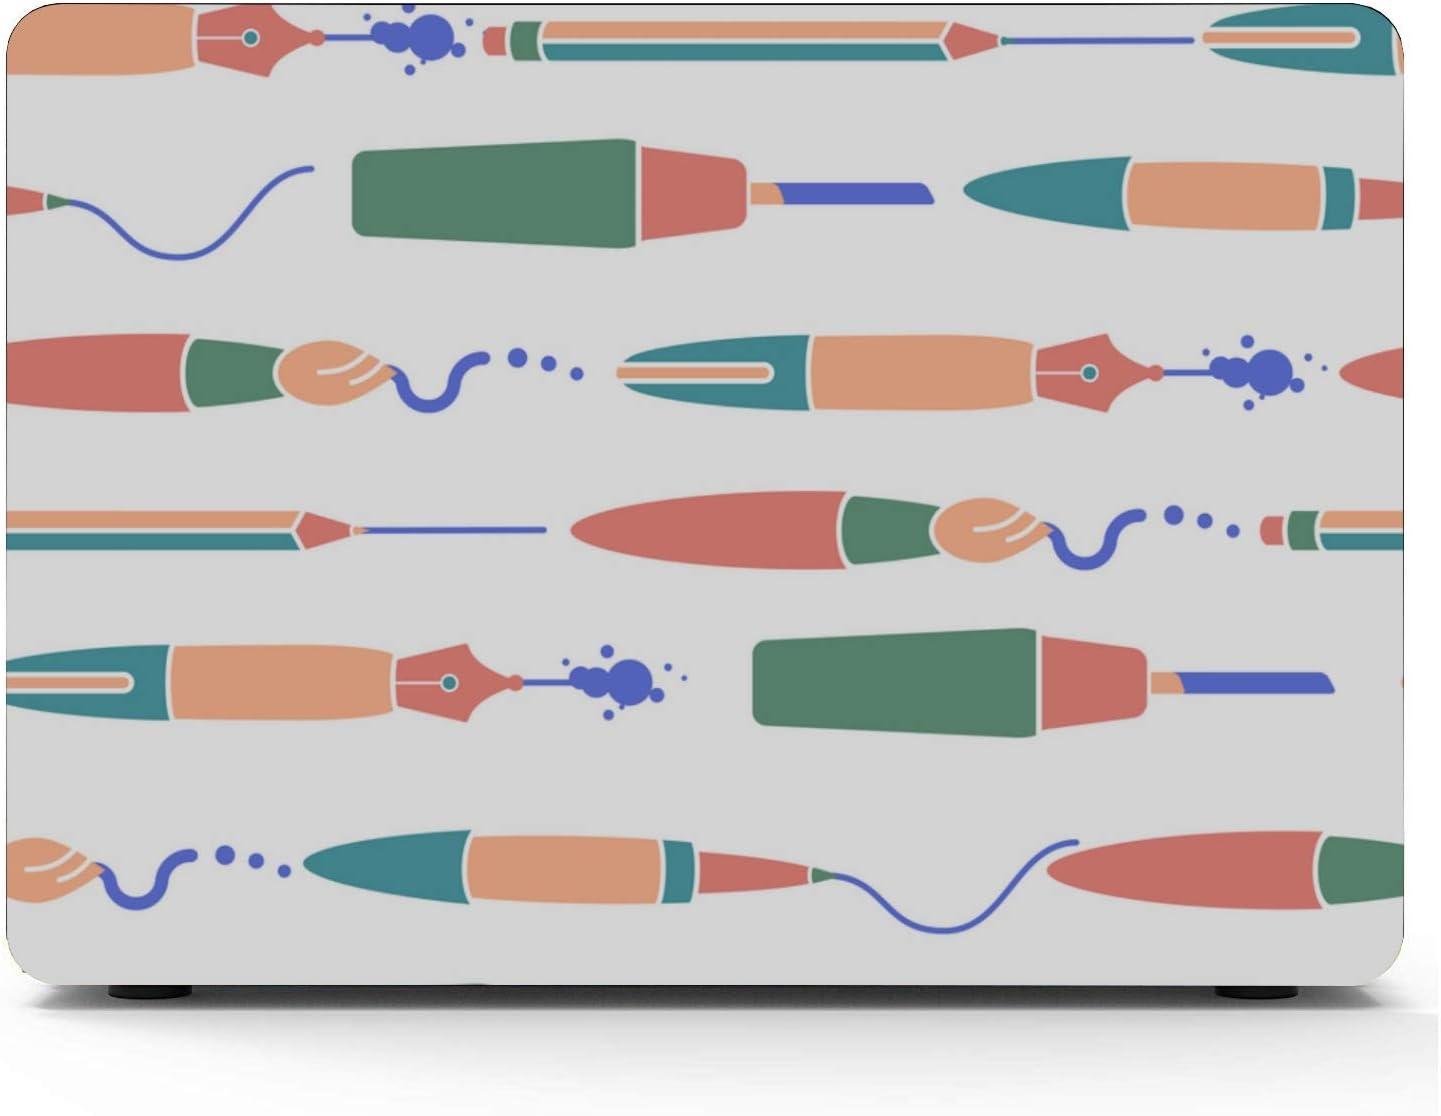 Mac Book Pro Accessories School Creative Art Fashion Pen Writing Plastic Hard Shell Compatible Mac Air 11 Pro 13 15 MacBook Pro 2018 Accessories Protection for MacBook 2016-2019 Version